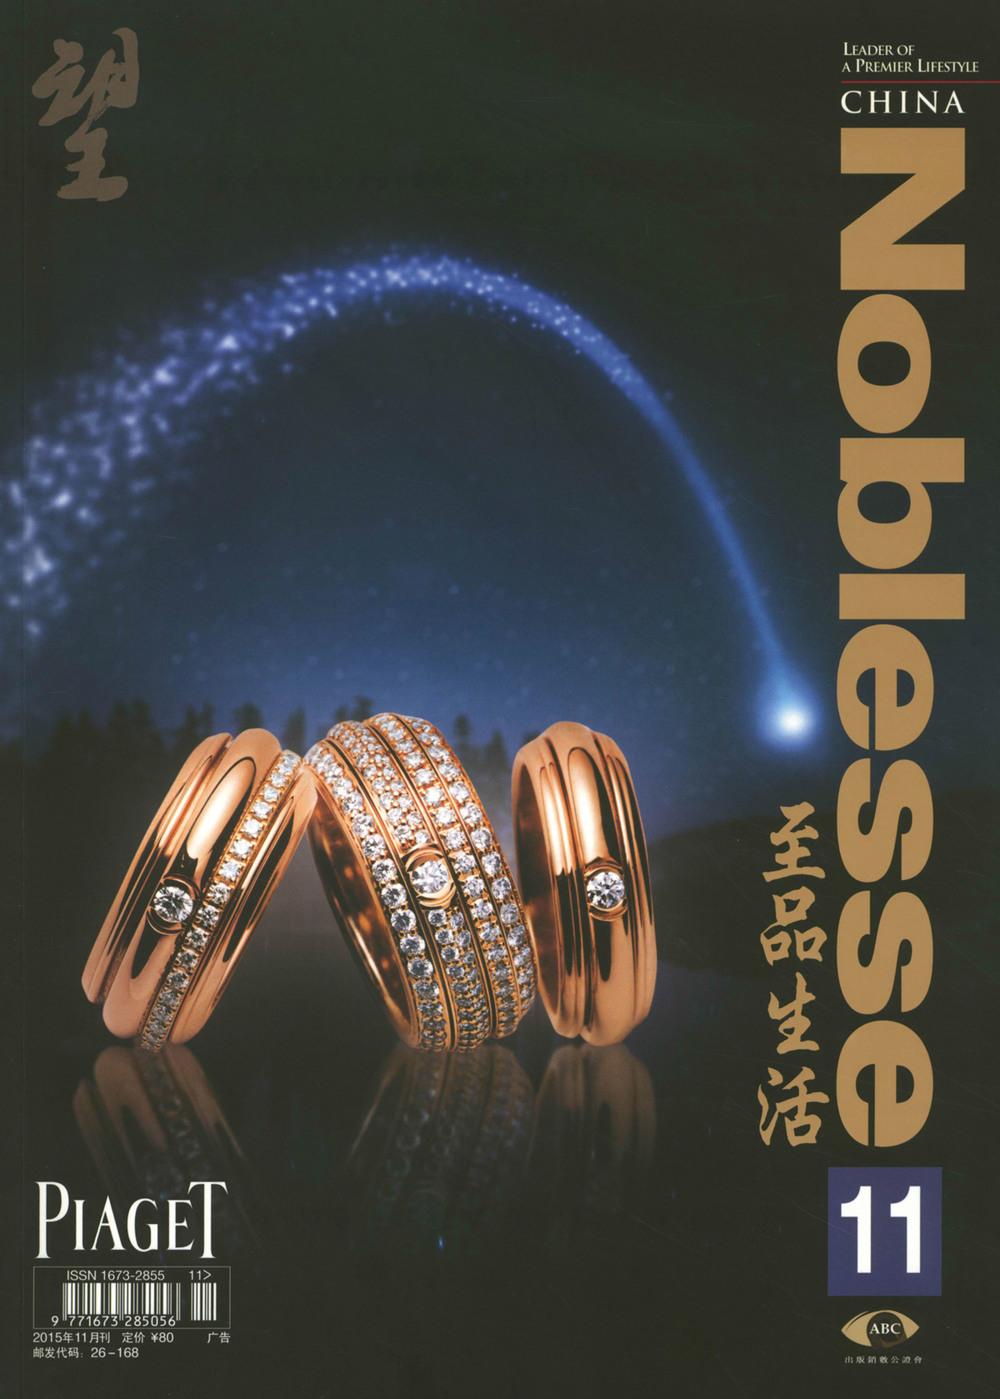 China-Noblesse(望)-November-P62-1-1.jpg